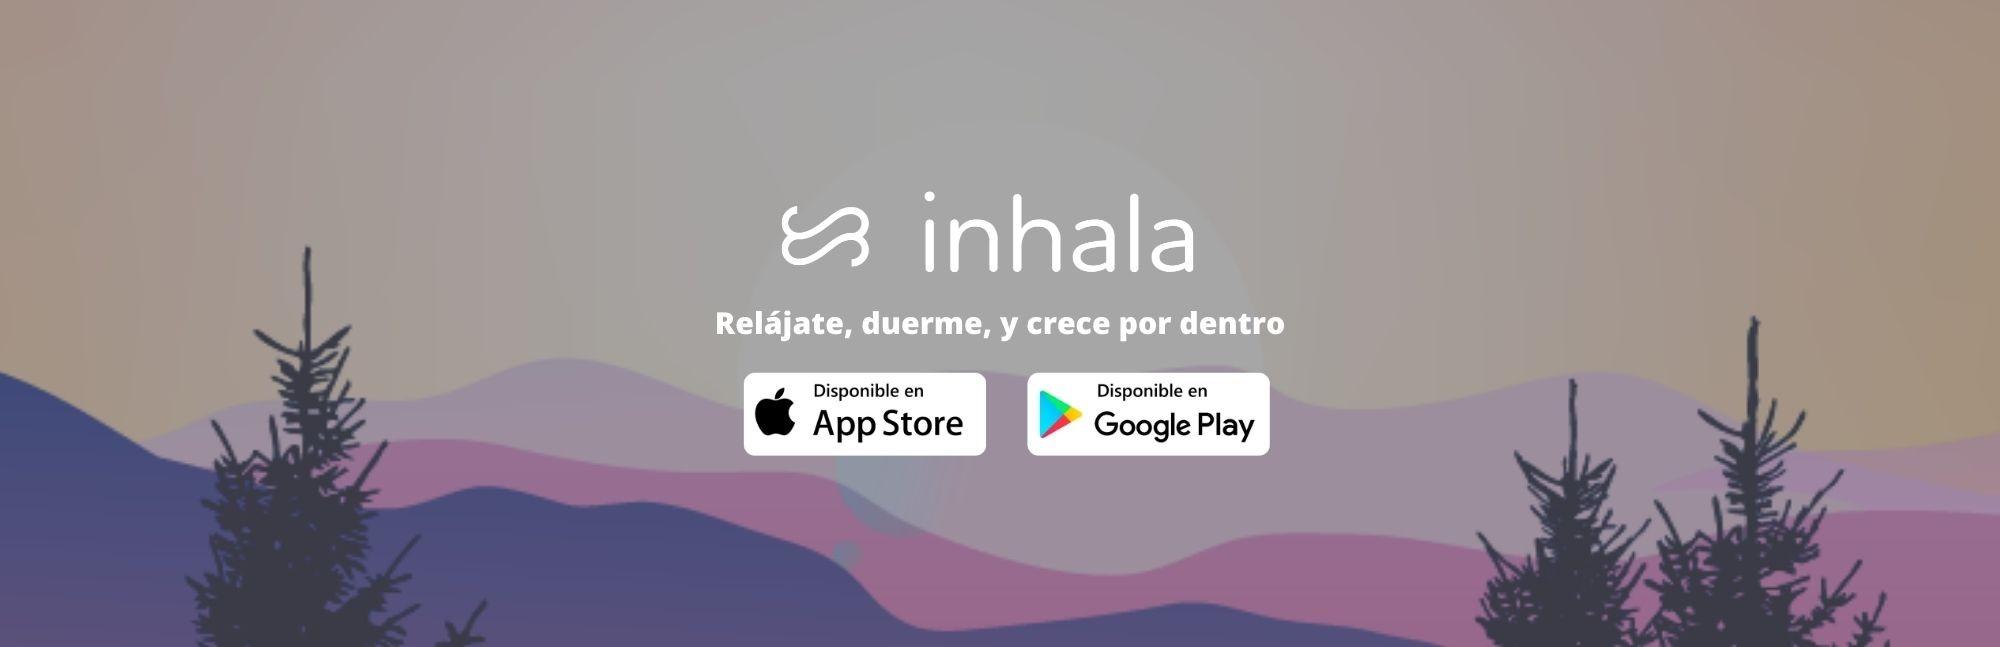 Inhala App | LinkedIn